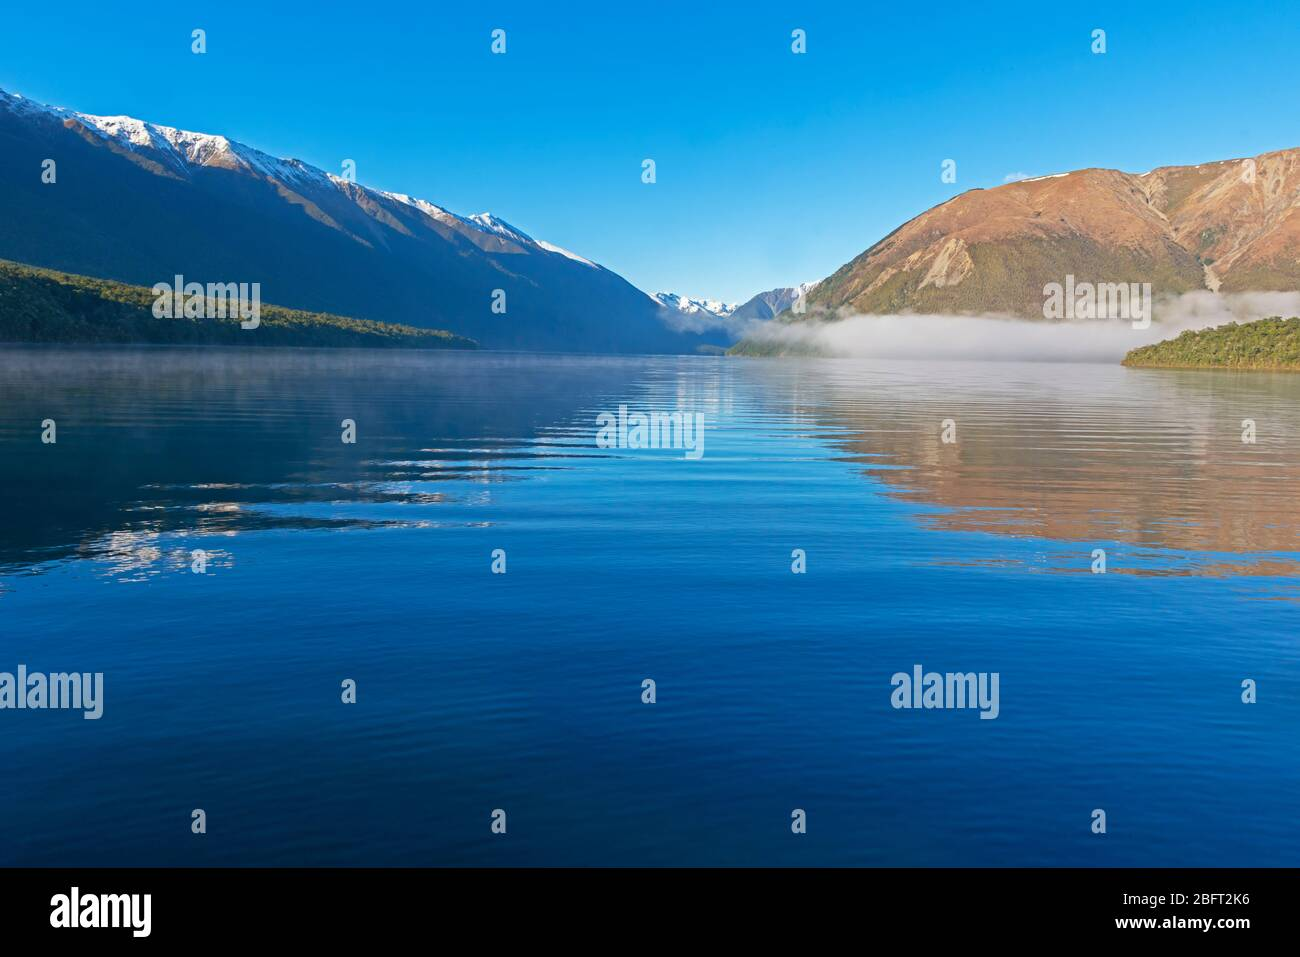 Lake Rotoiti, Nelson Lakes National Park, New Zealand, Stock Photo